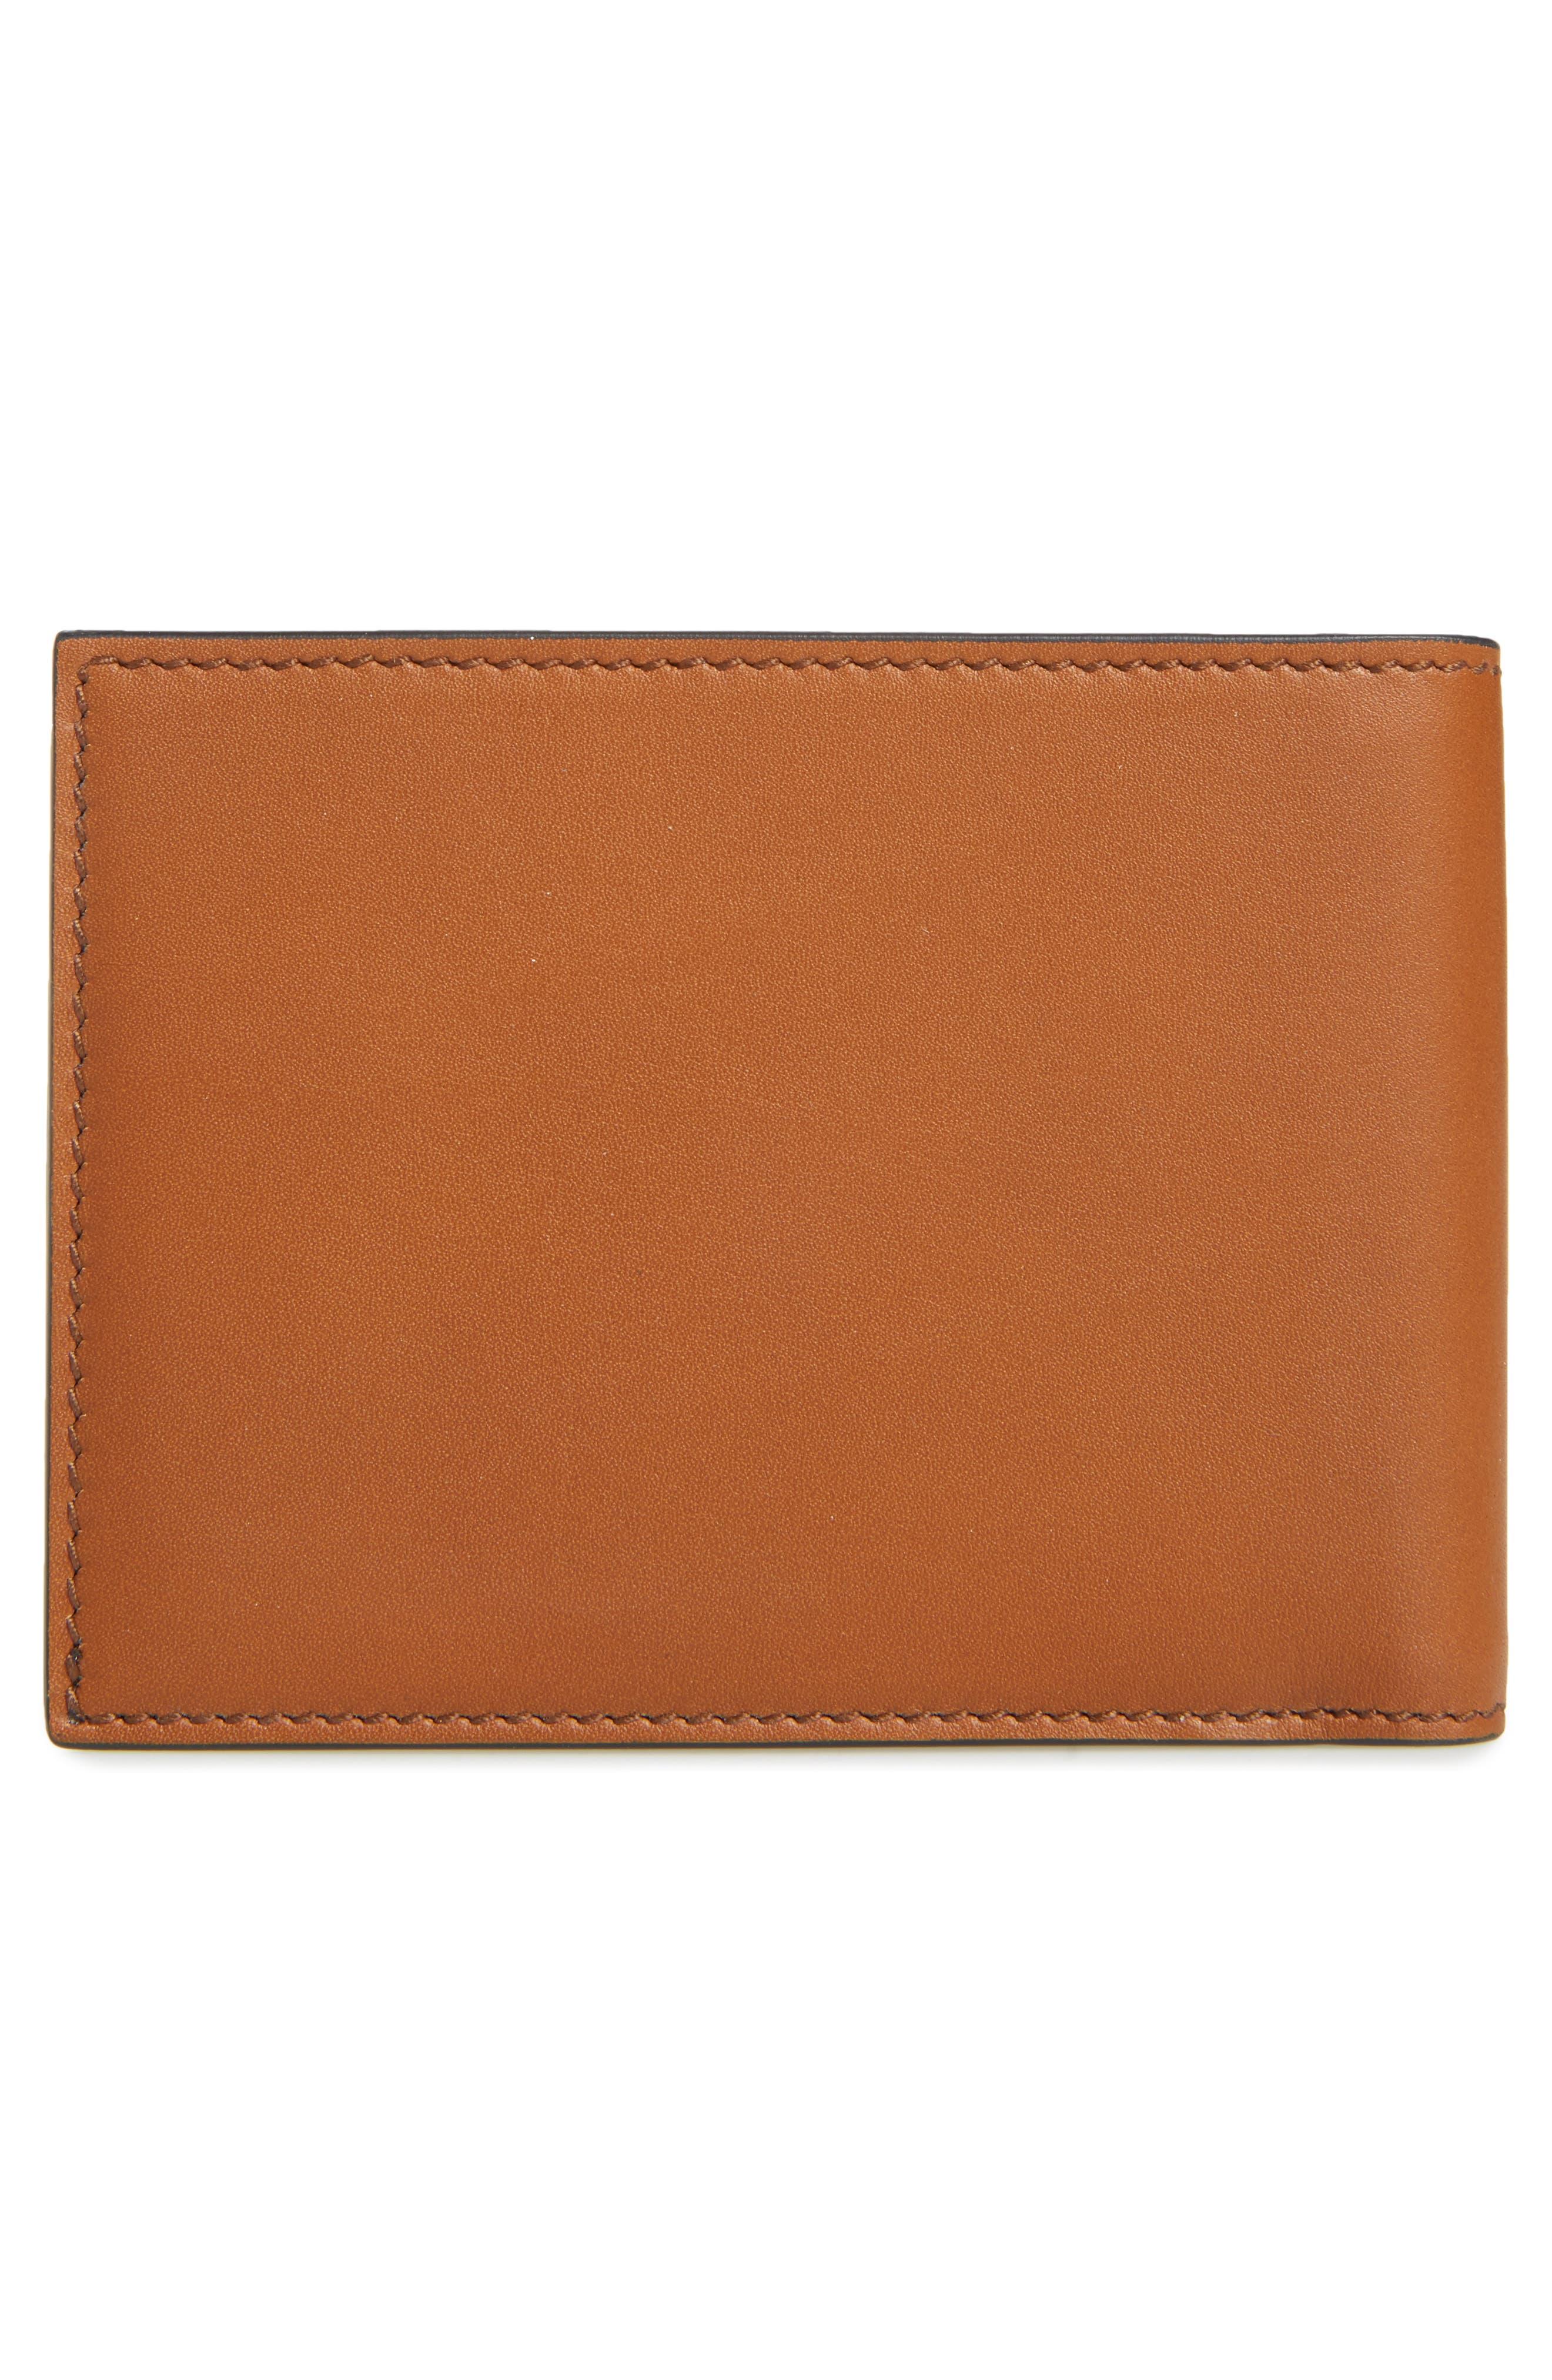 Calfskin Leather Bifold Wallet,                             Alternate thumbnail 3, color,                             Radica